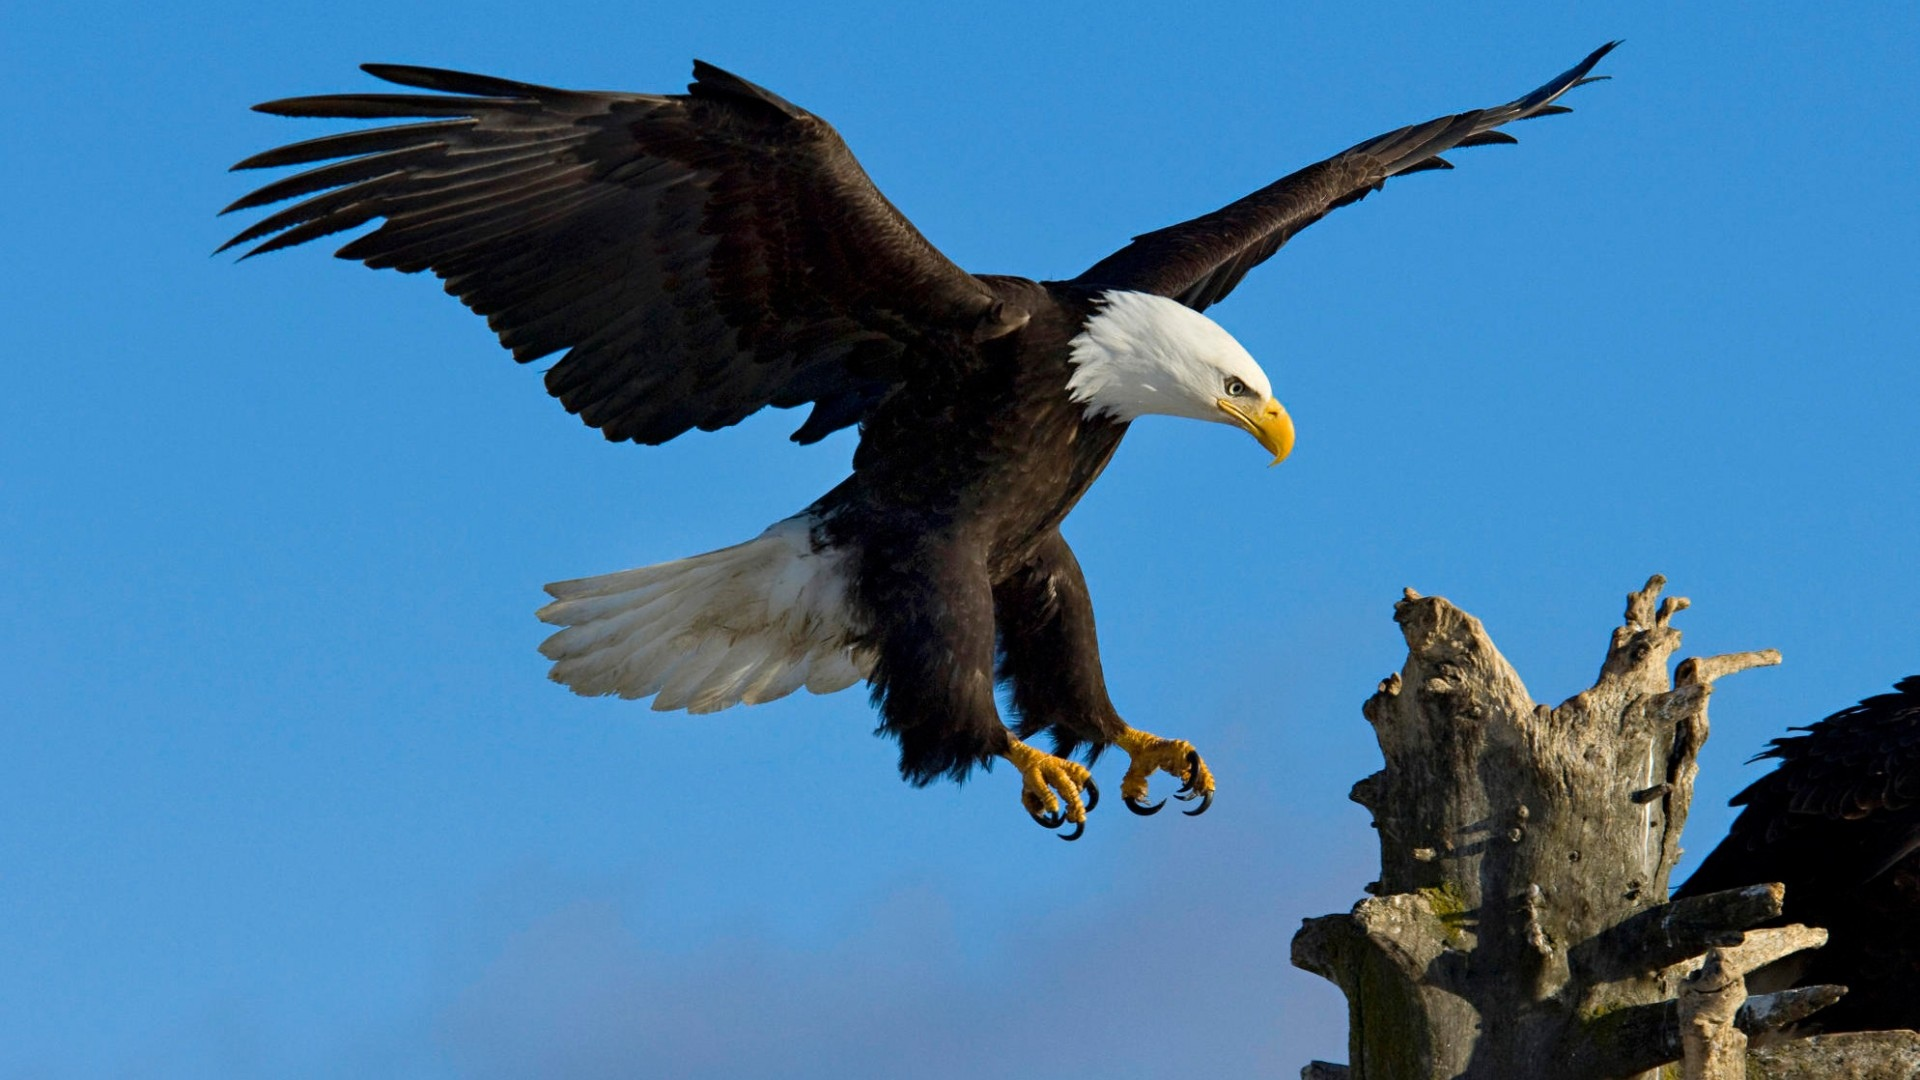 HD-eagle-pictures-ile-ilgili-g%C3%B6rsel-sonucu-wallpaper-wp5601152